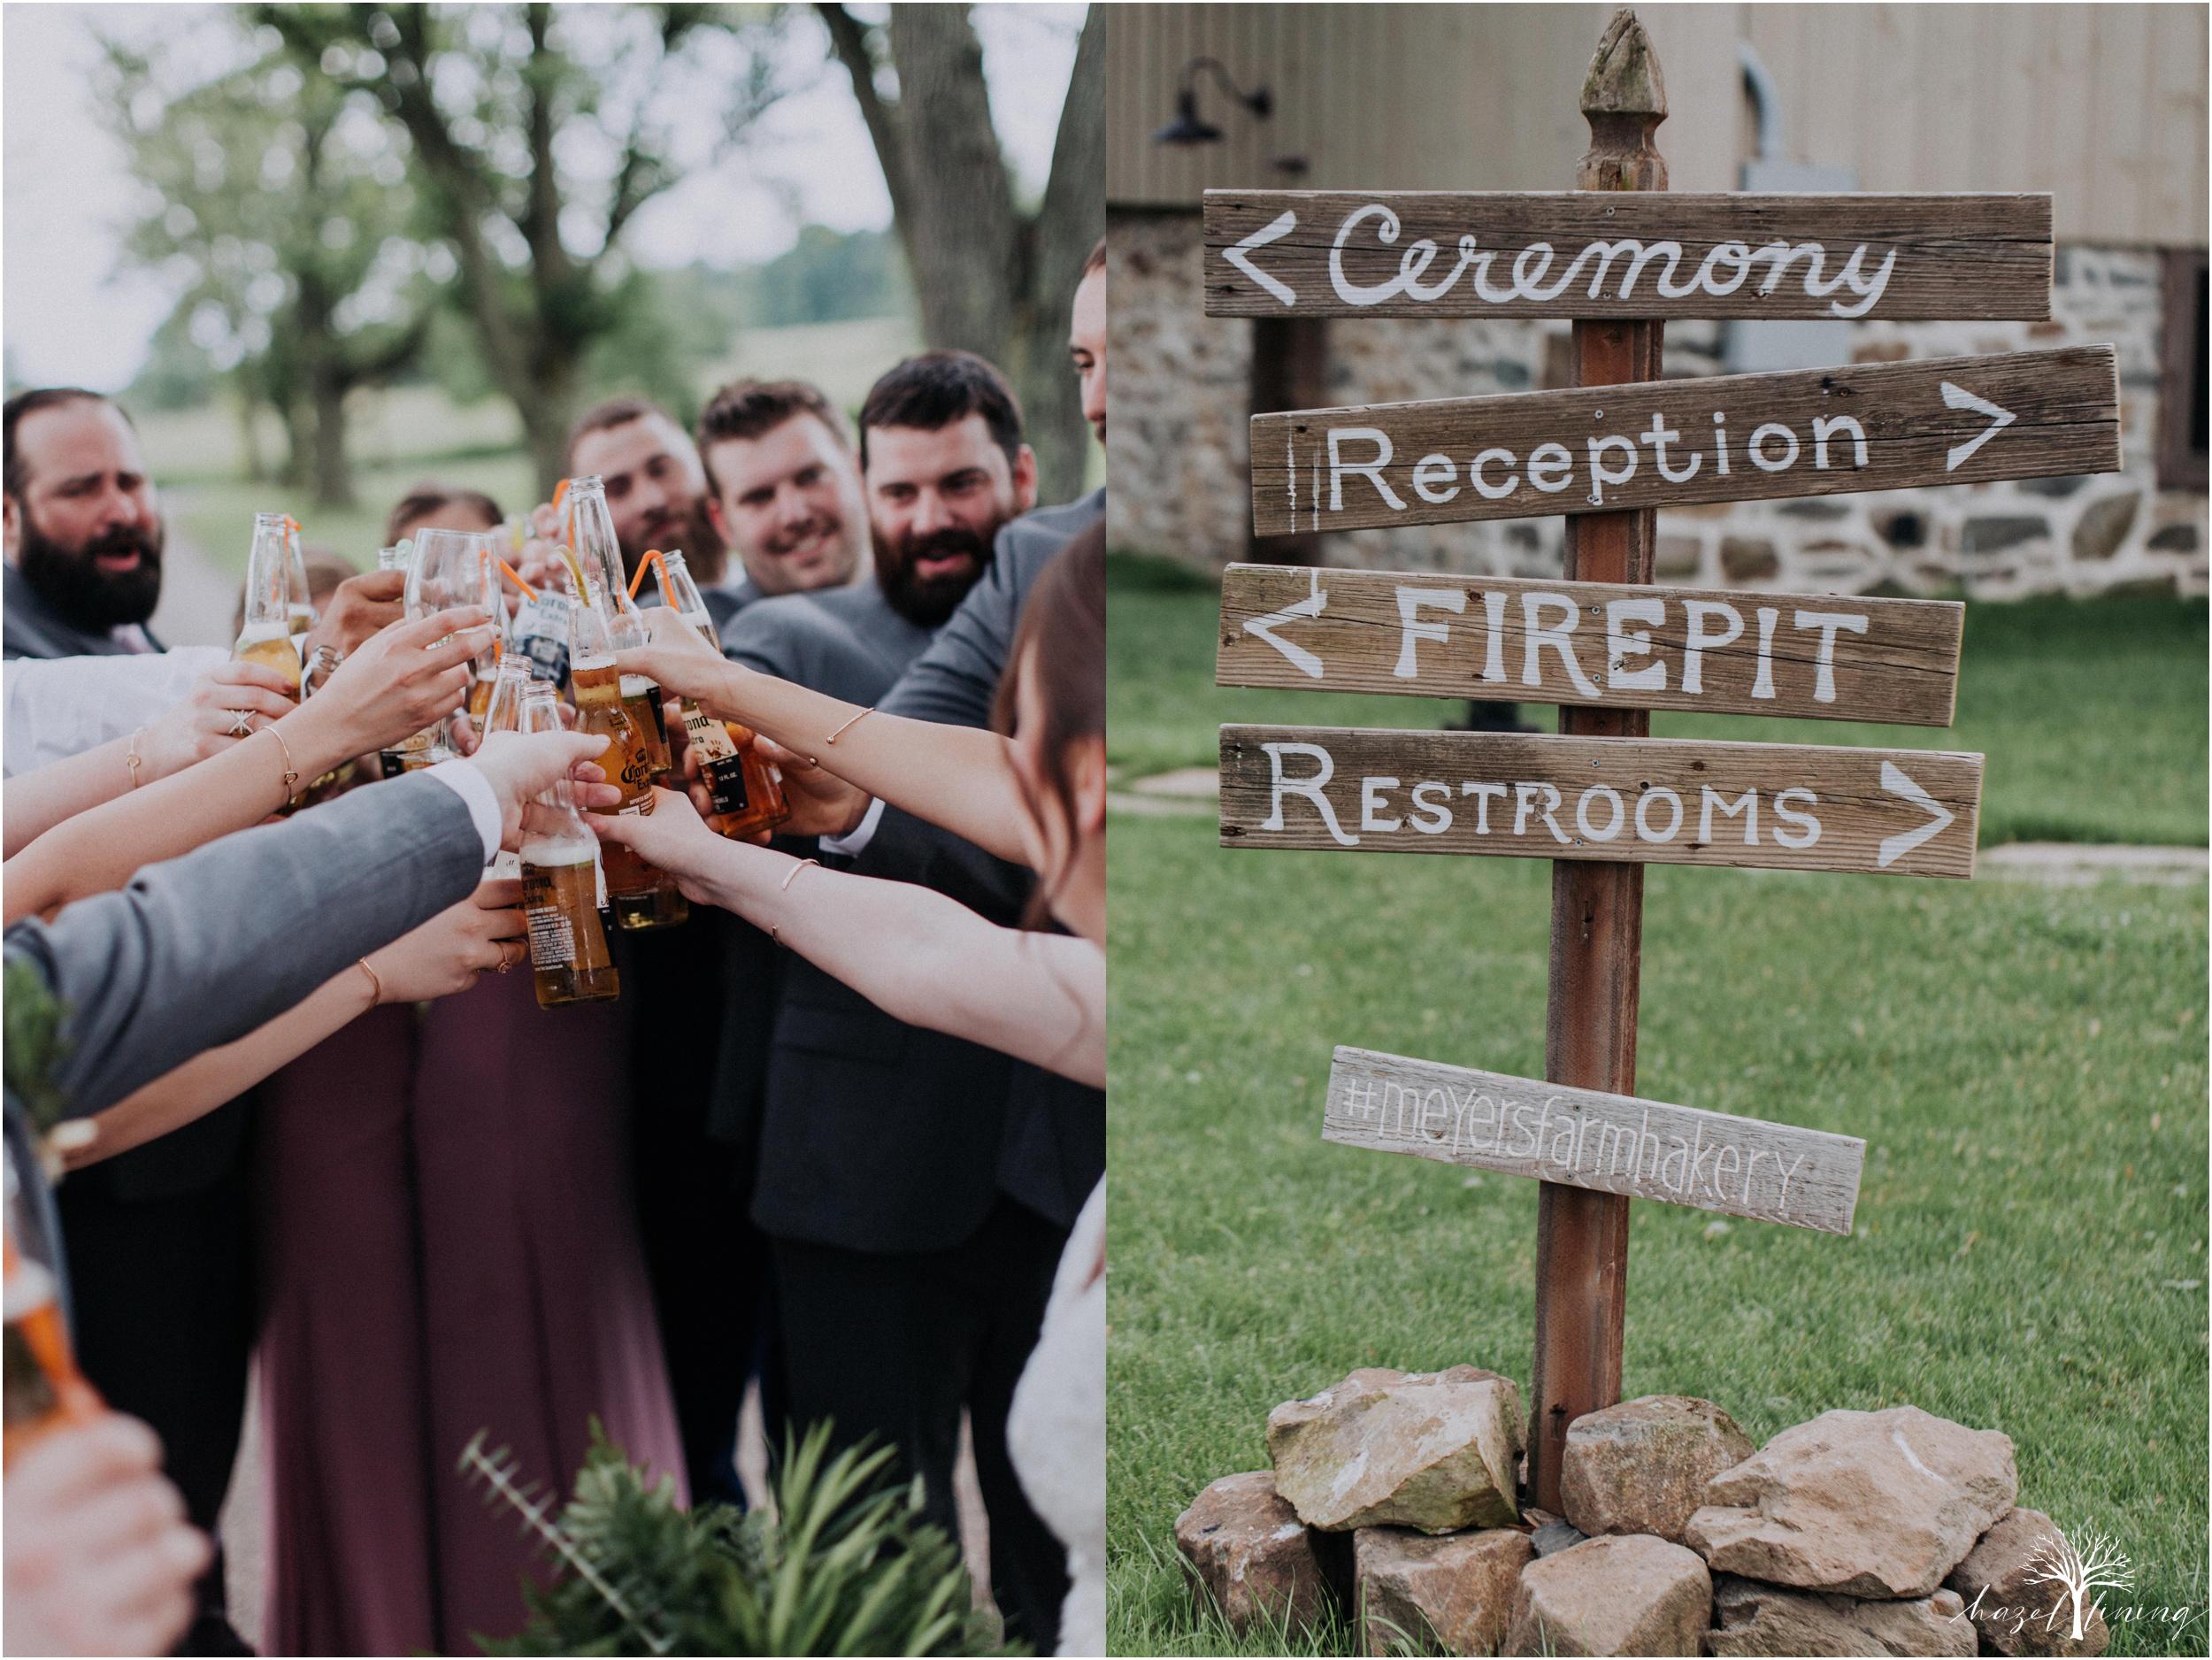 hazel-lining-travel-wedding-elopement-photography-lisa-landon-shoemaker-the-farm-bakery-and-events-bucks-county-quakertown-pennsylvania-summer-country-outdoor-farm-wedding_0106.jpg